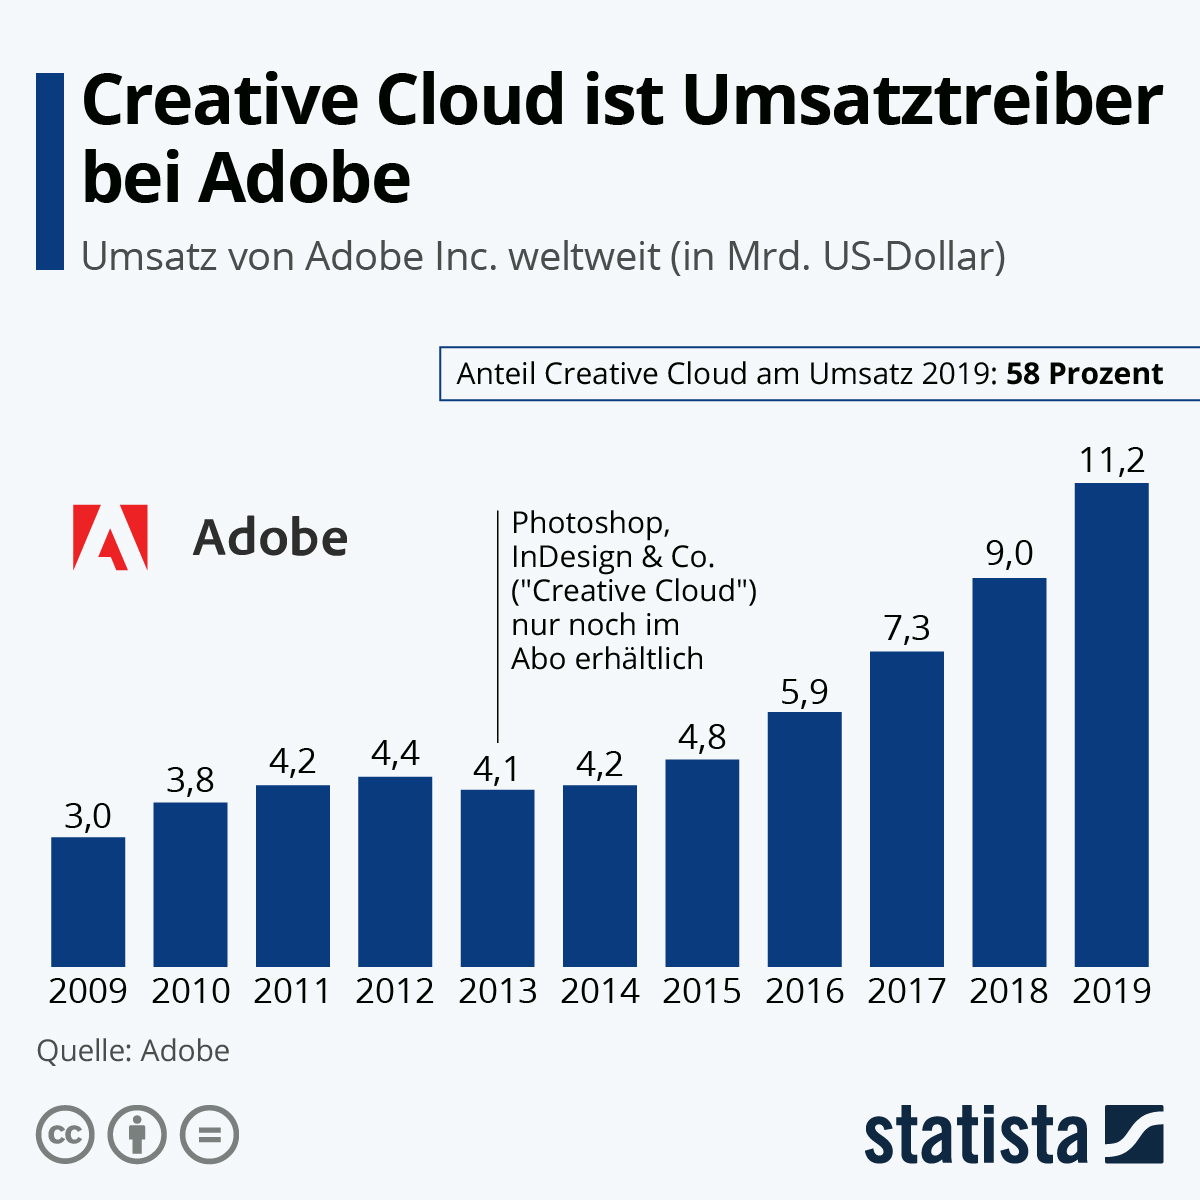 Infografik: Creative Cloud ist Umsatztreiber bei Adobe | Statista